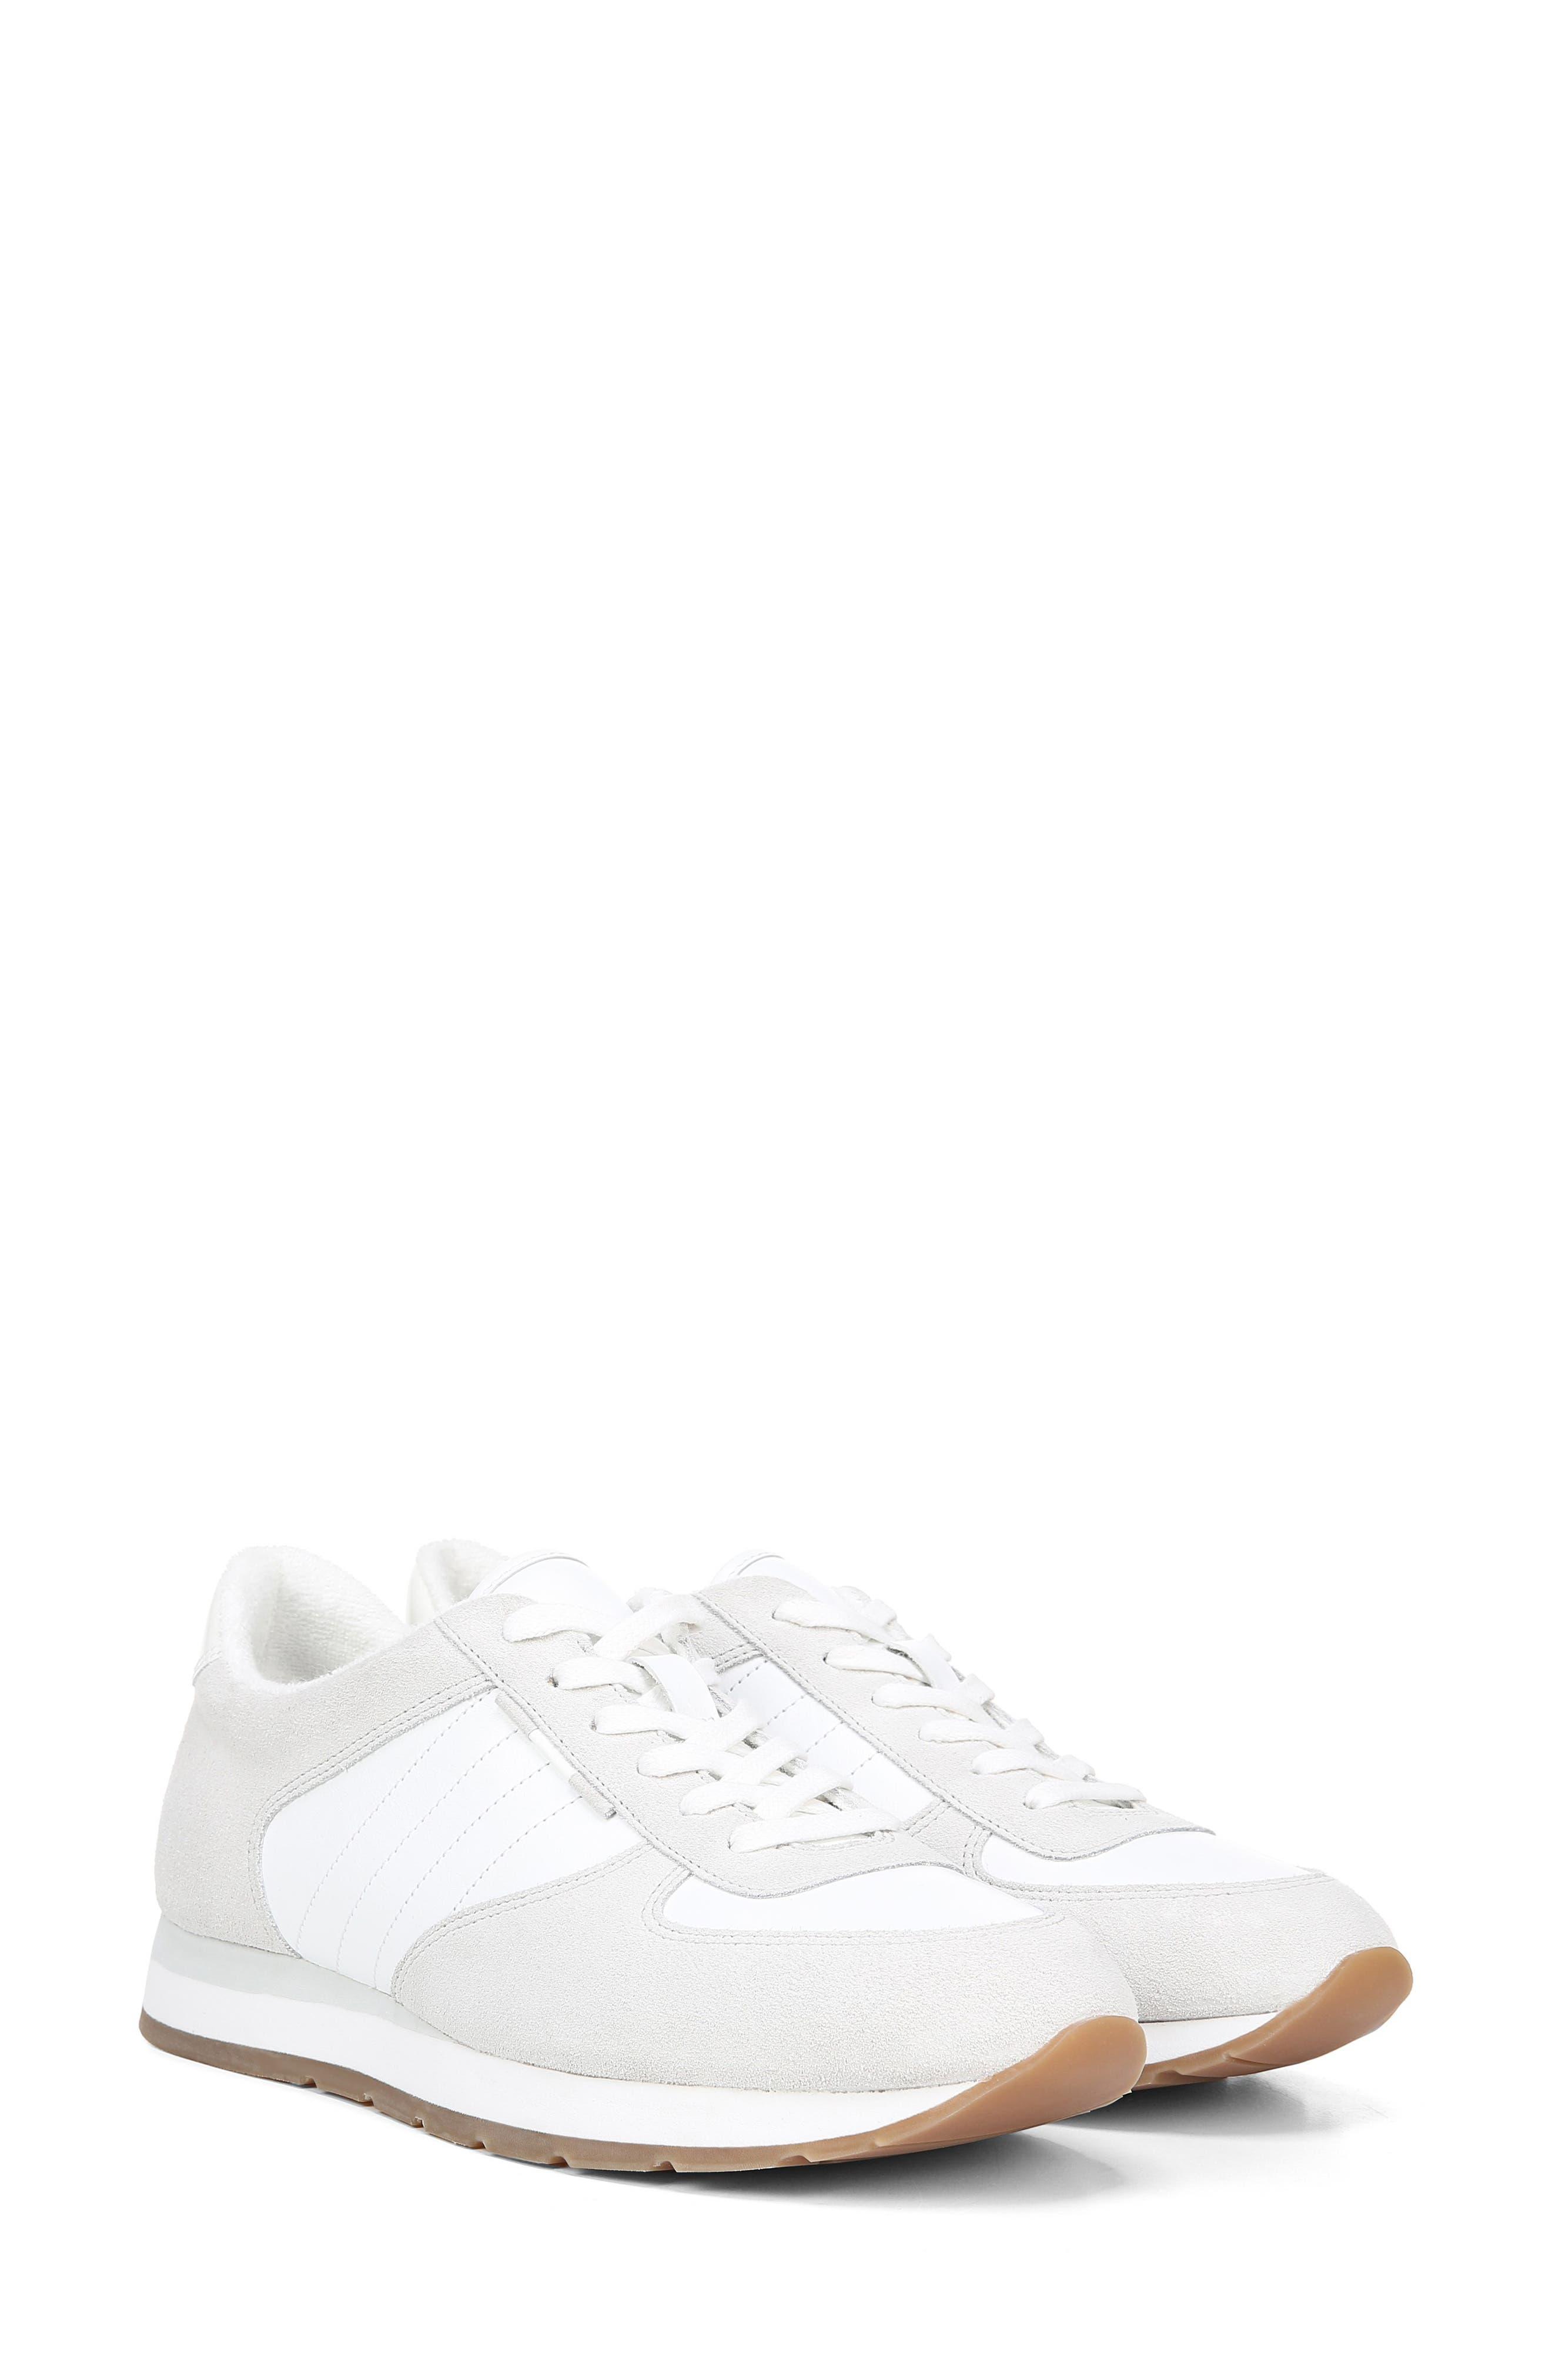 VINCE, Pasha Sneaker, Alternate thumbnail 9, color, WHITE